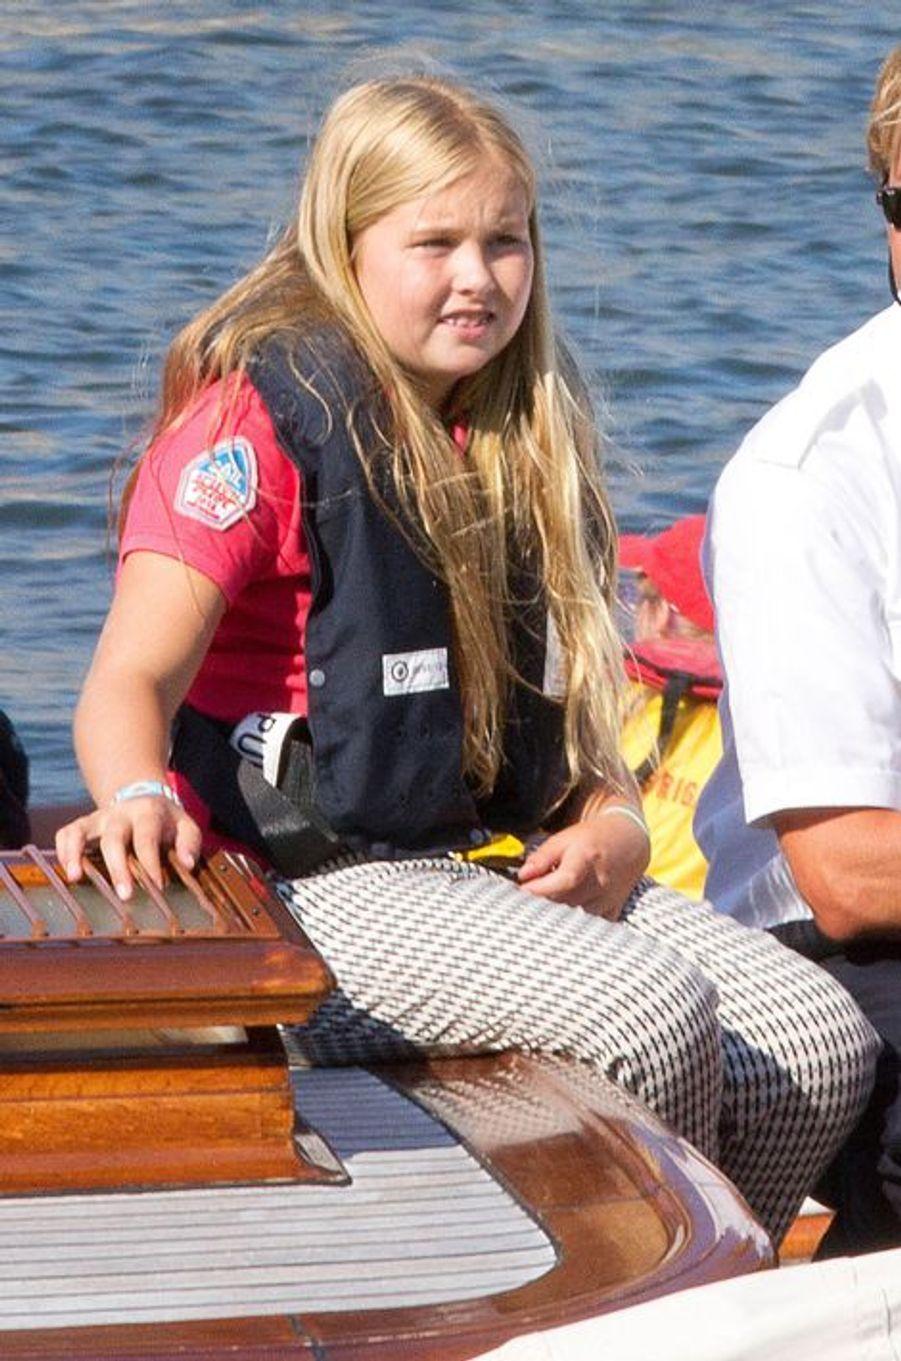 La princesse Catharina-Amalia des Pays-Bas au Sail Amsterdam, le 22 août 2015